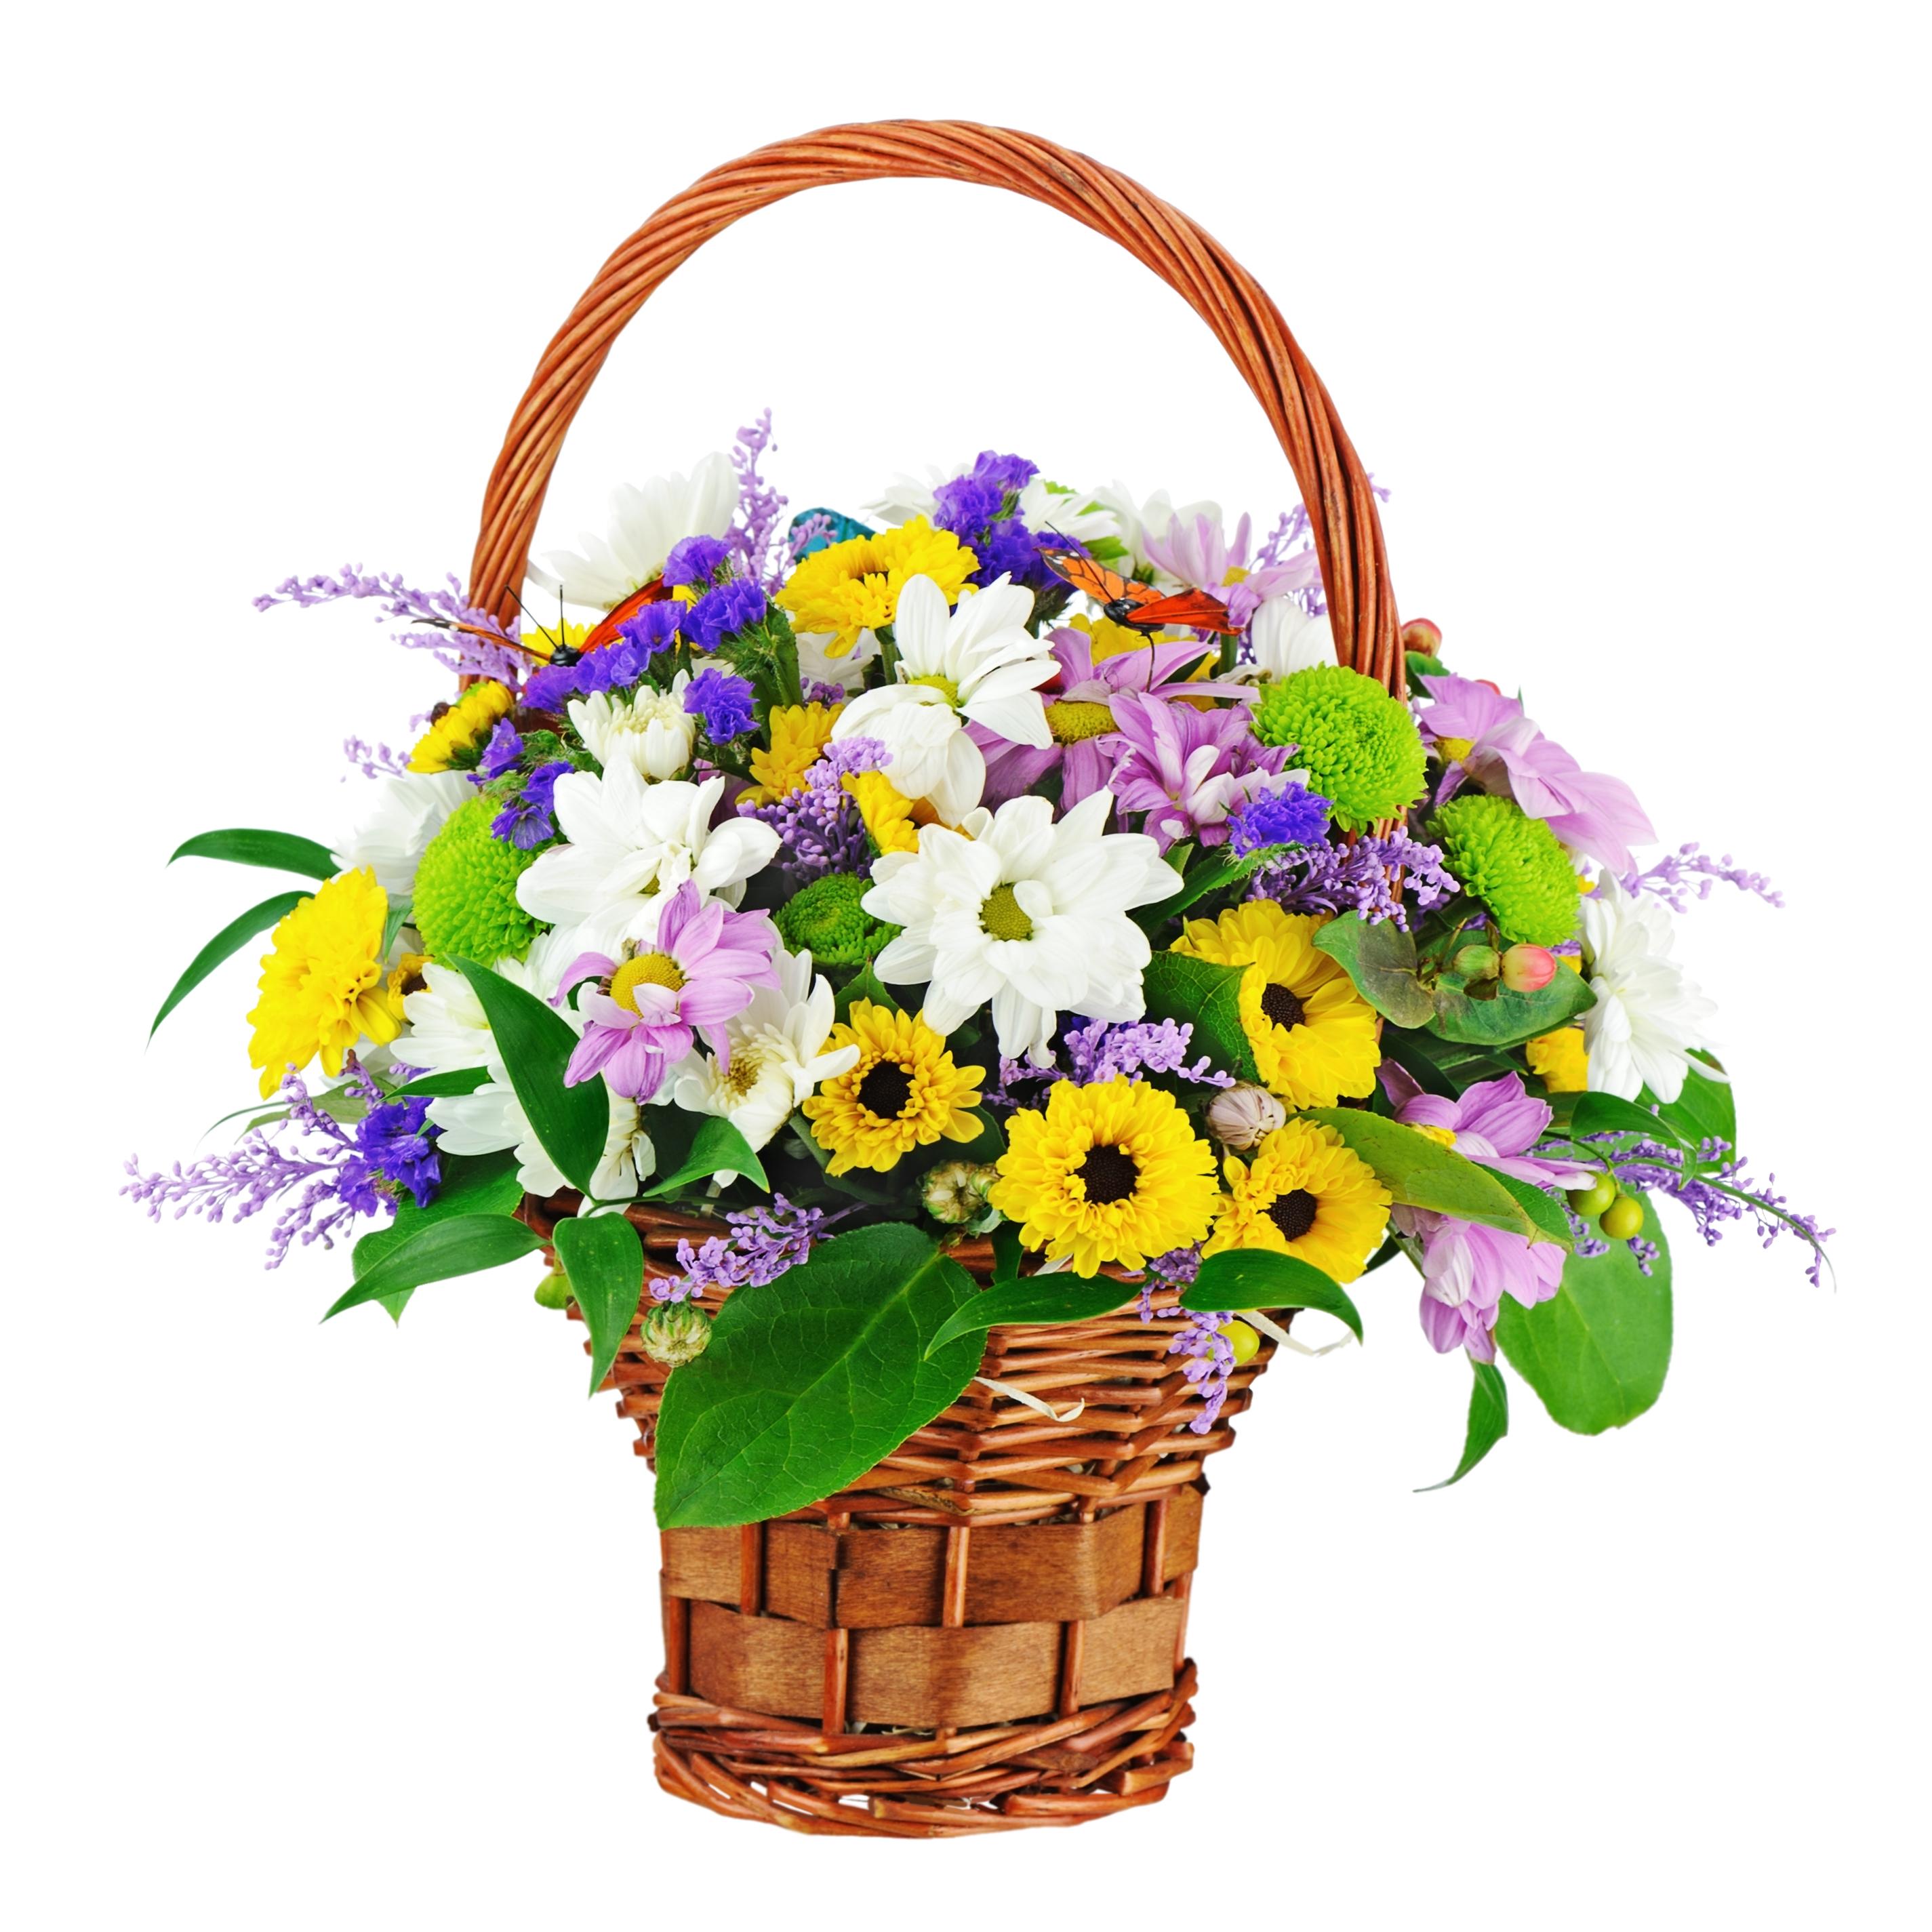 Chrysanthemums dhalia fleuriste flower bouquet in wicker basket isolated on white background closeup izmirmasajfo